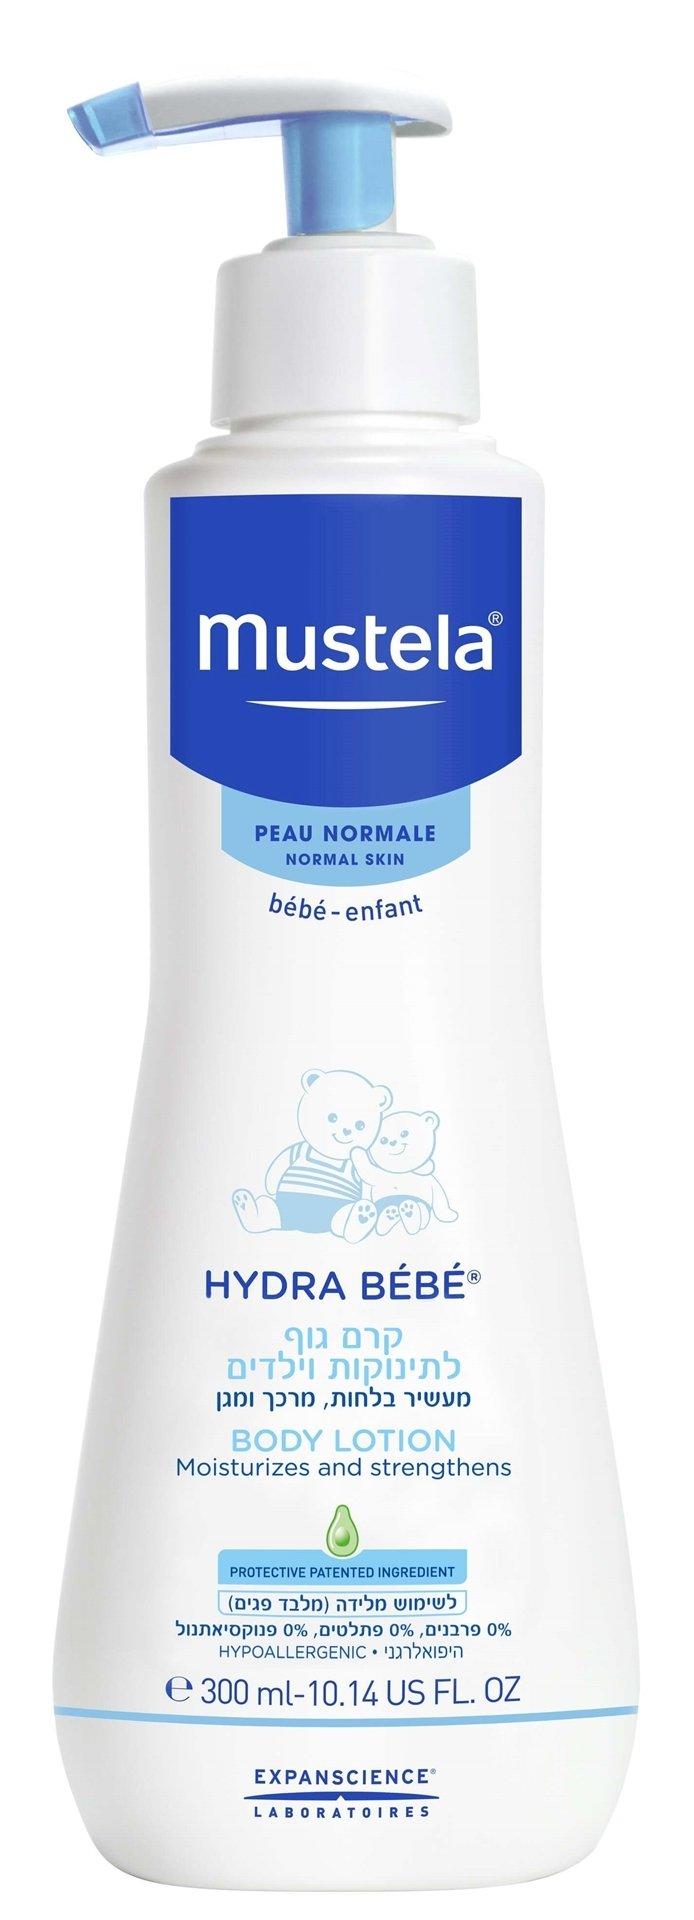 Mustela Body Lotion